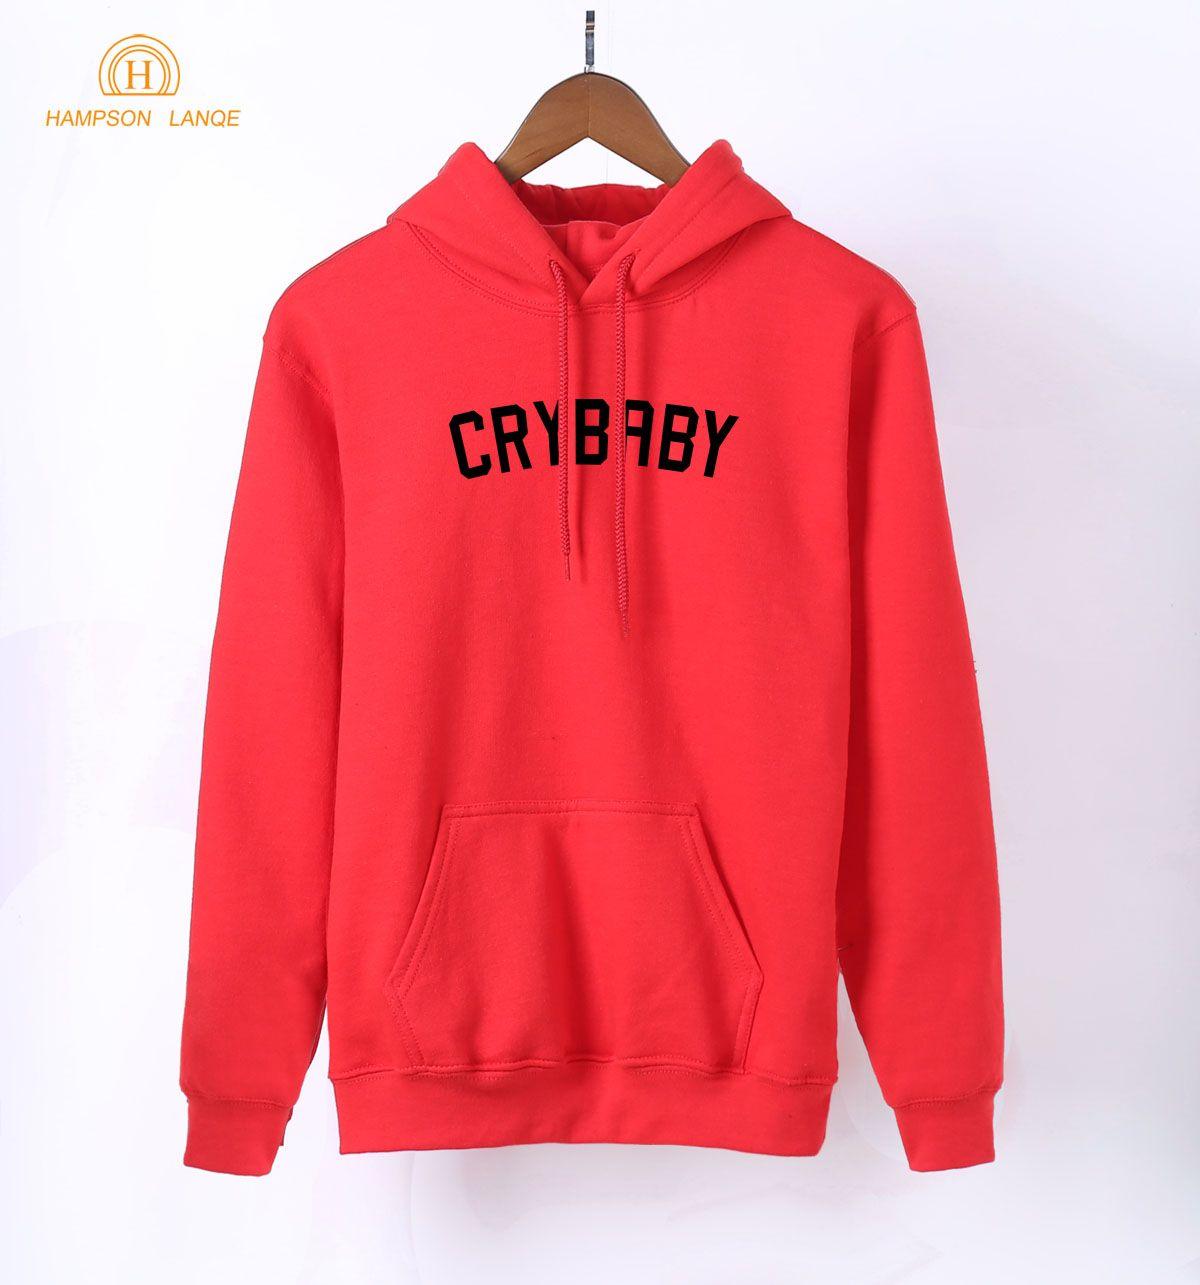 43e74ae8821f 2019 HAMPSON LANQE Crybaby Cry Baby Kawaii Pink Sweatshirt Female ...